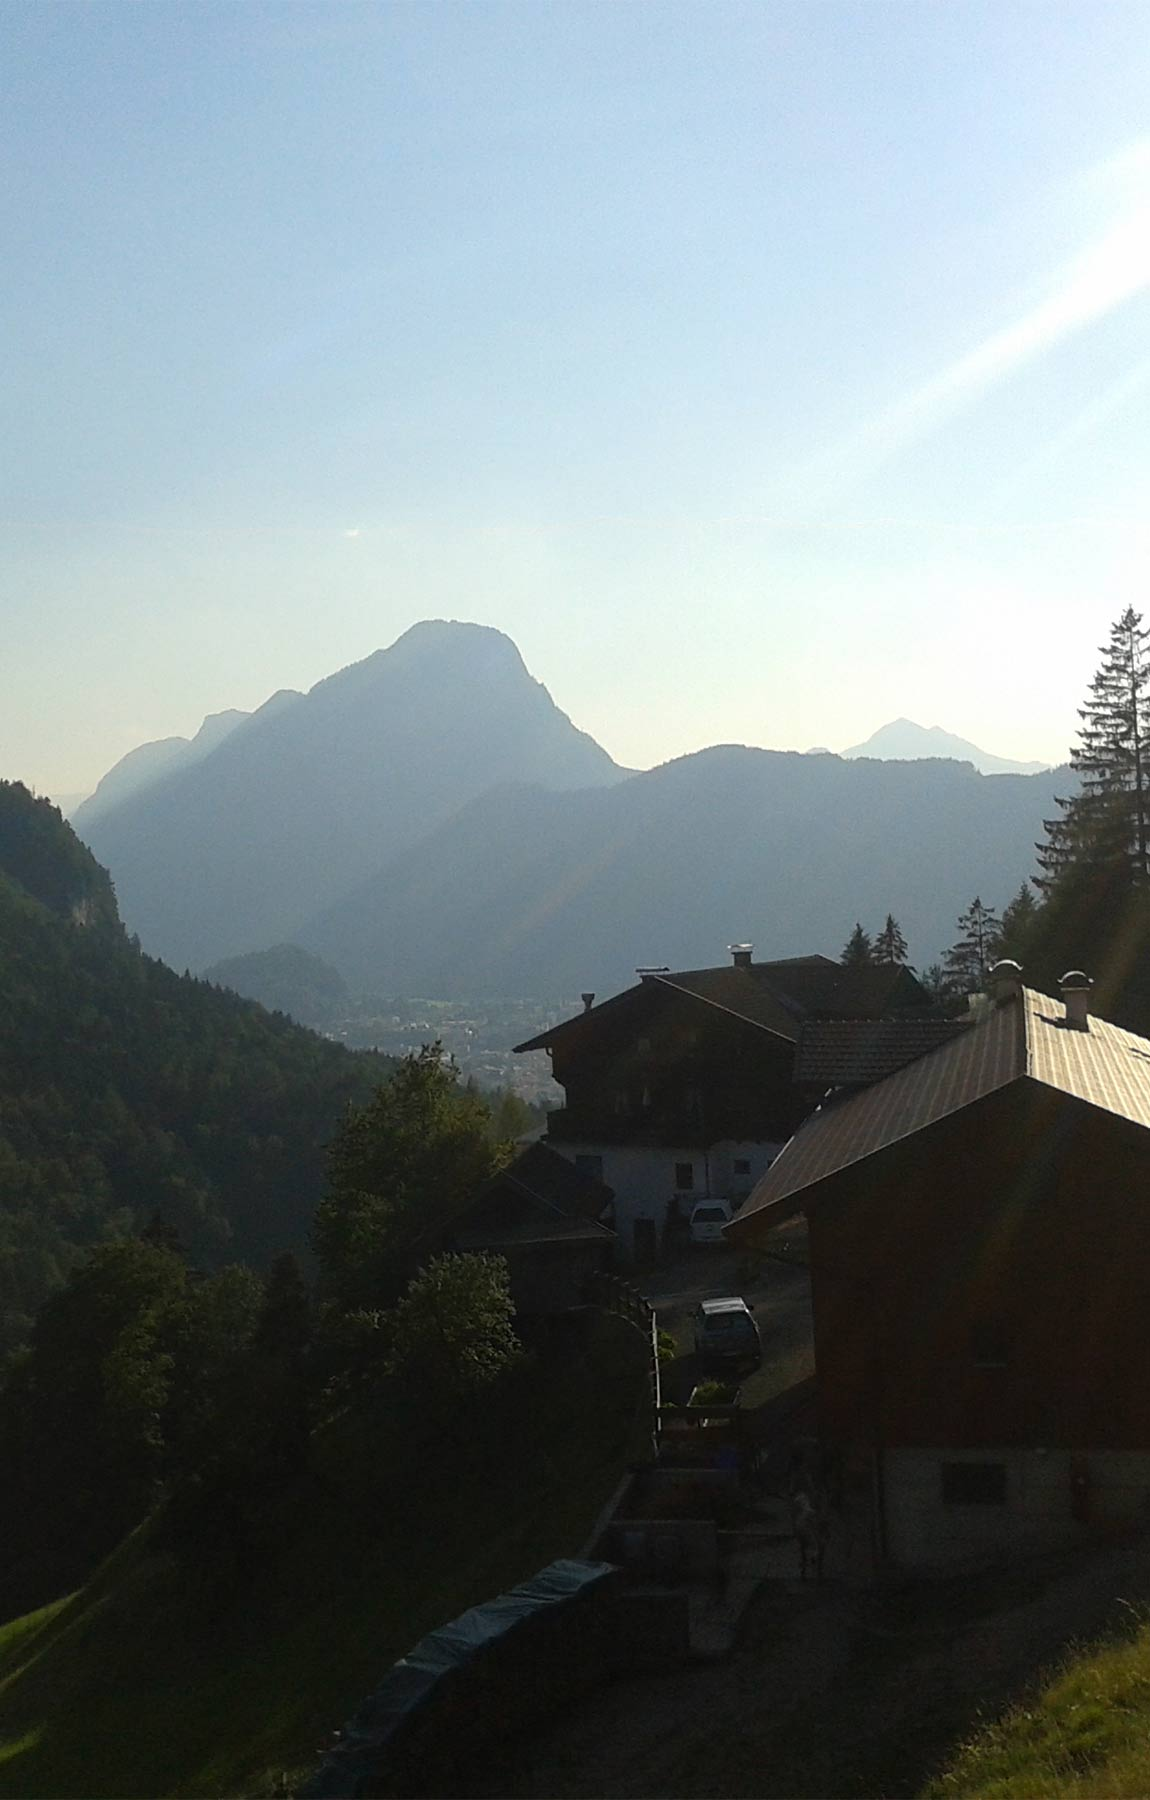 bergwanderführer tirol - wanderung im kaisergebirge